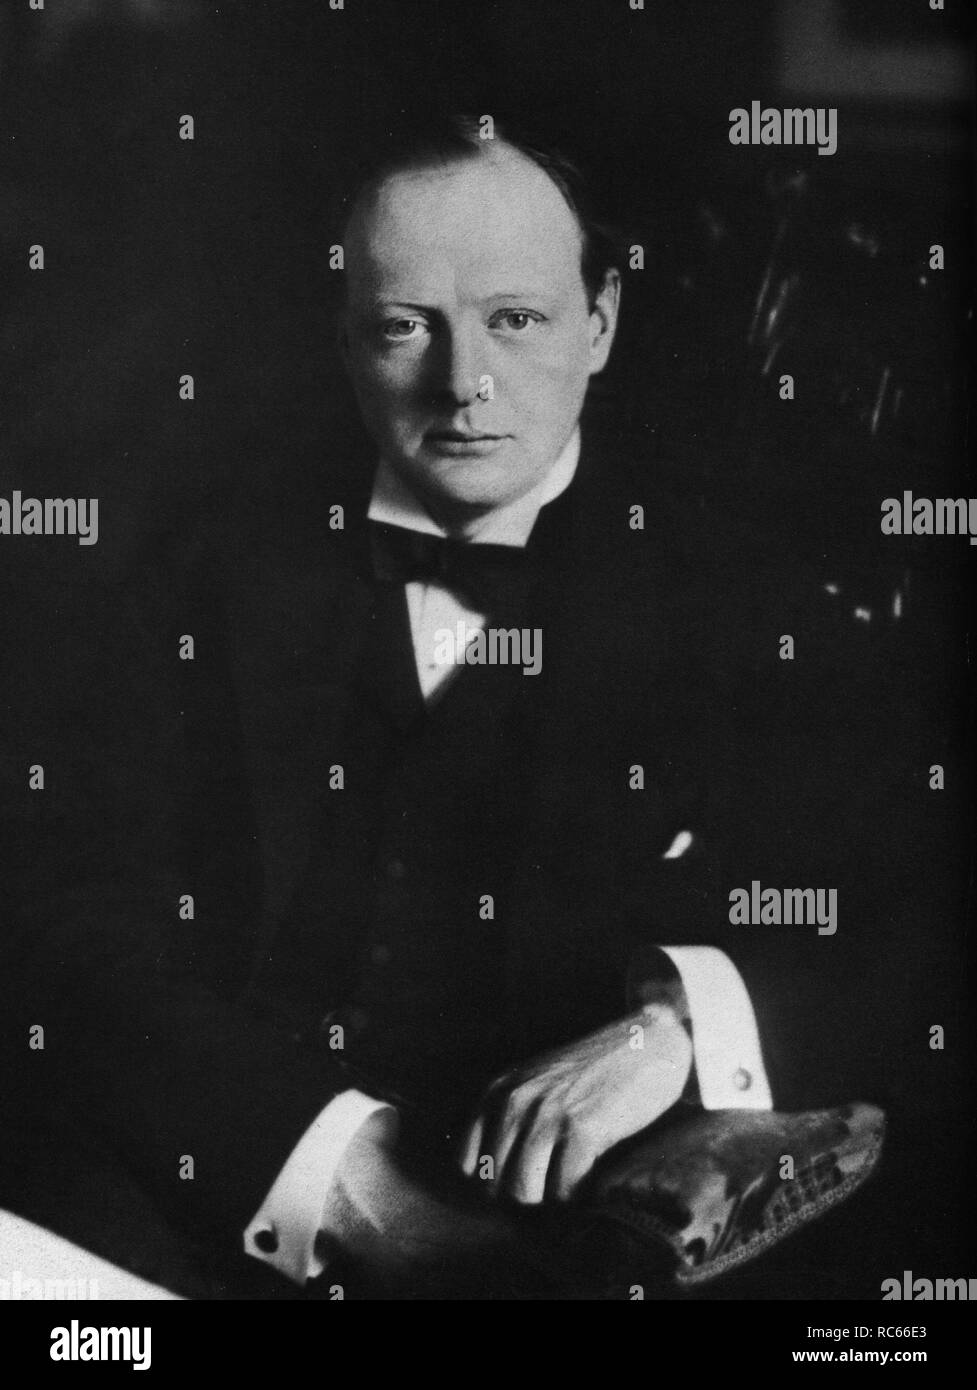 Portrait photograph of Winston Churchill taken in 1908 Stock Photo